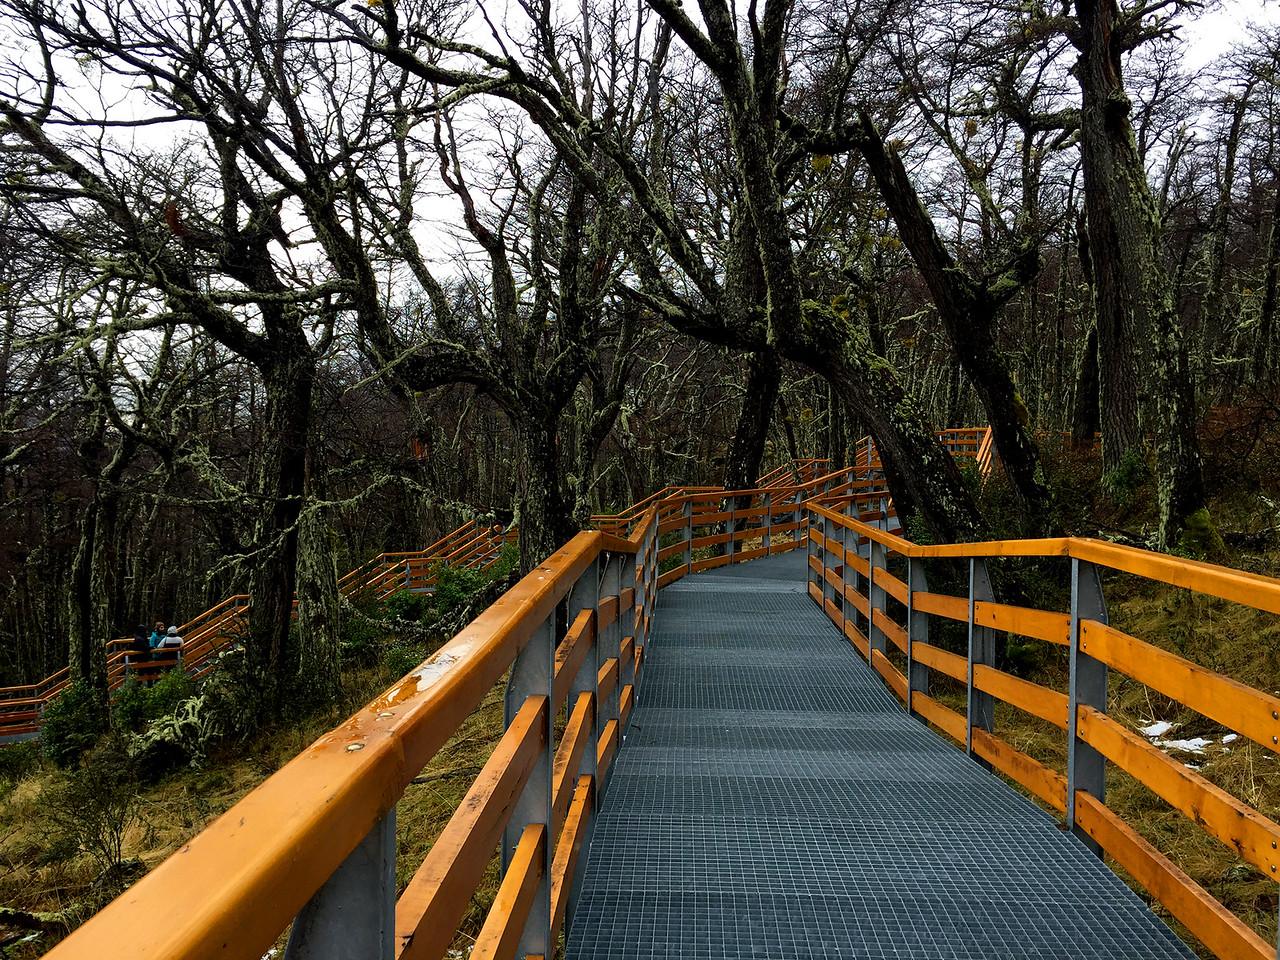 The ramps leading to Perito Moreno glacier, El Calafate, Patagonia